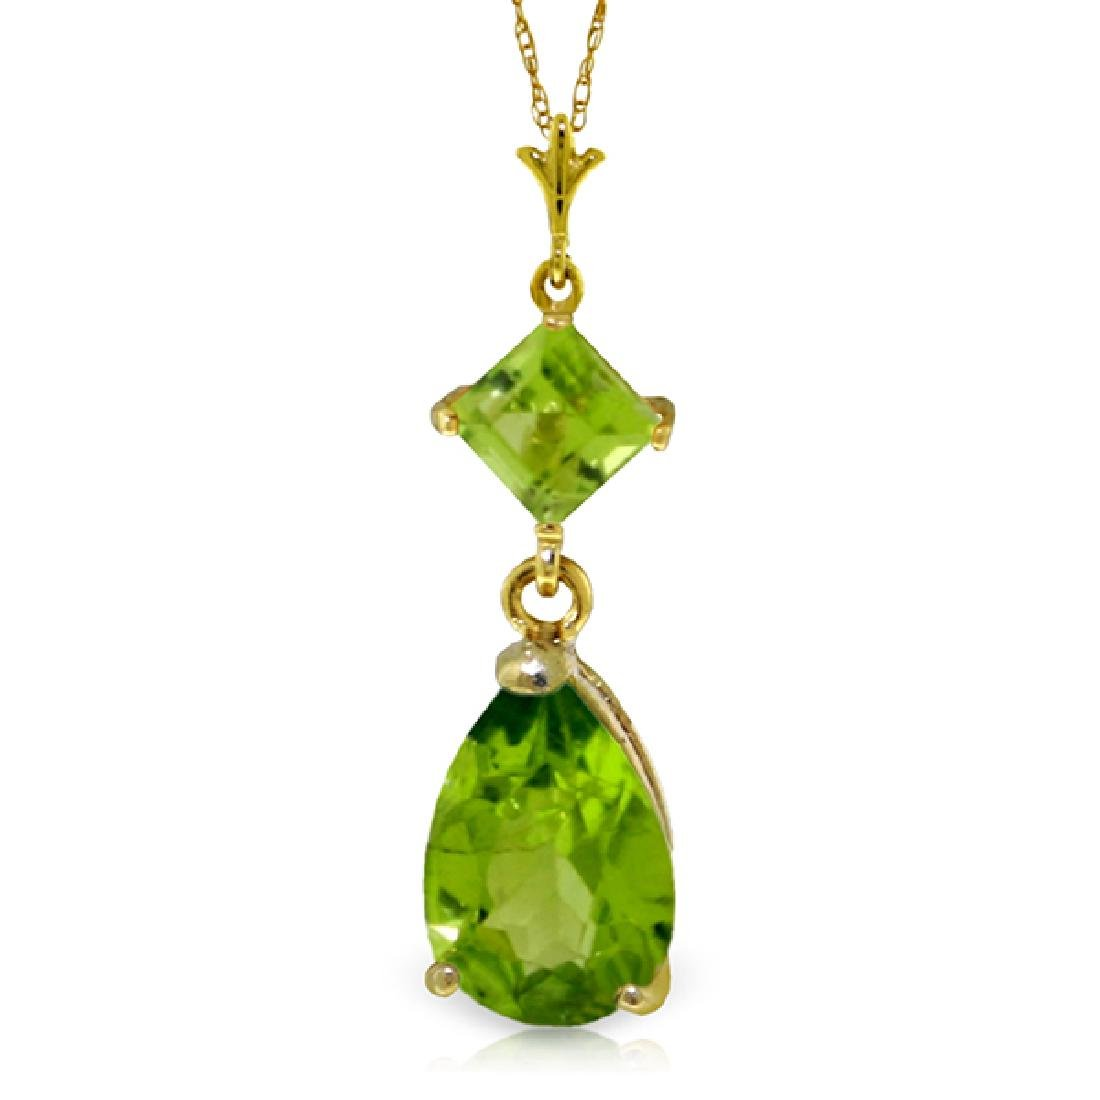 Genuine 2 ctw Peridot Necklace Jewelry 14KT Yellow Gold